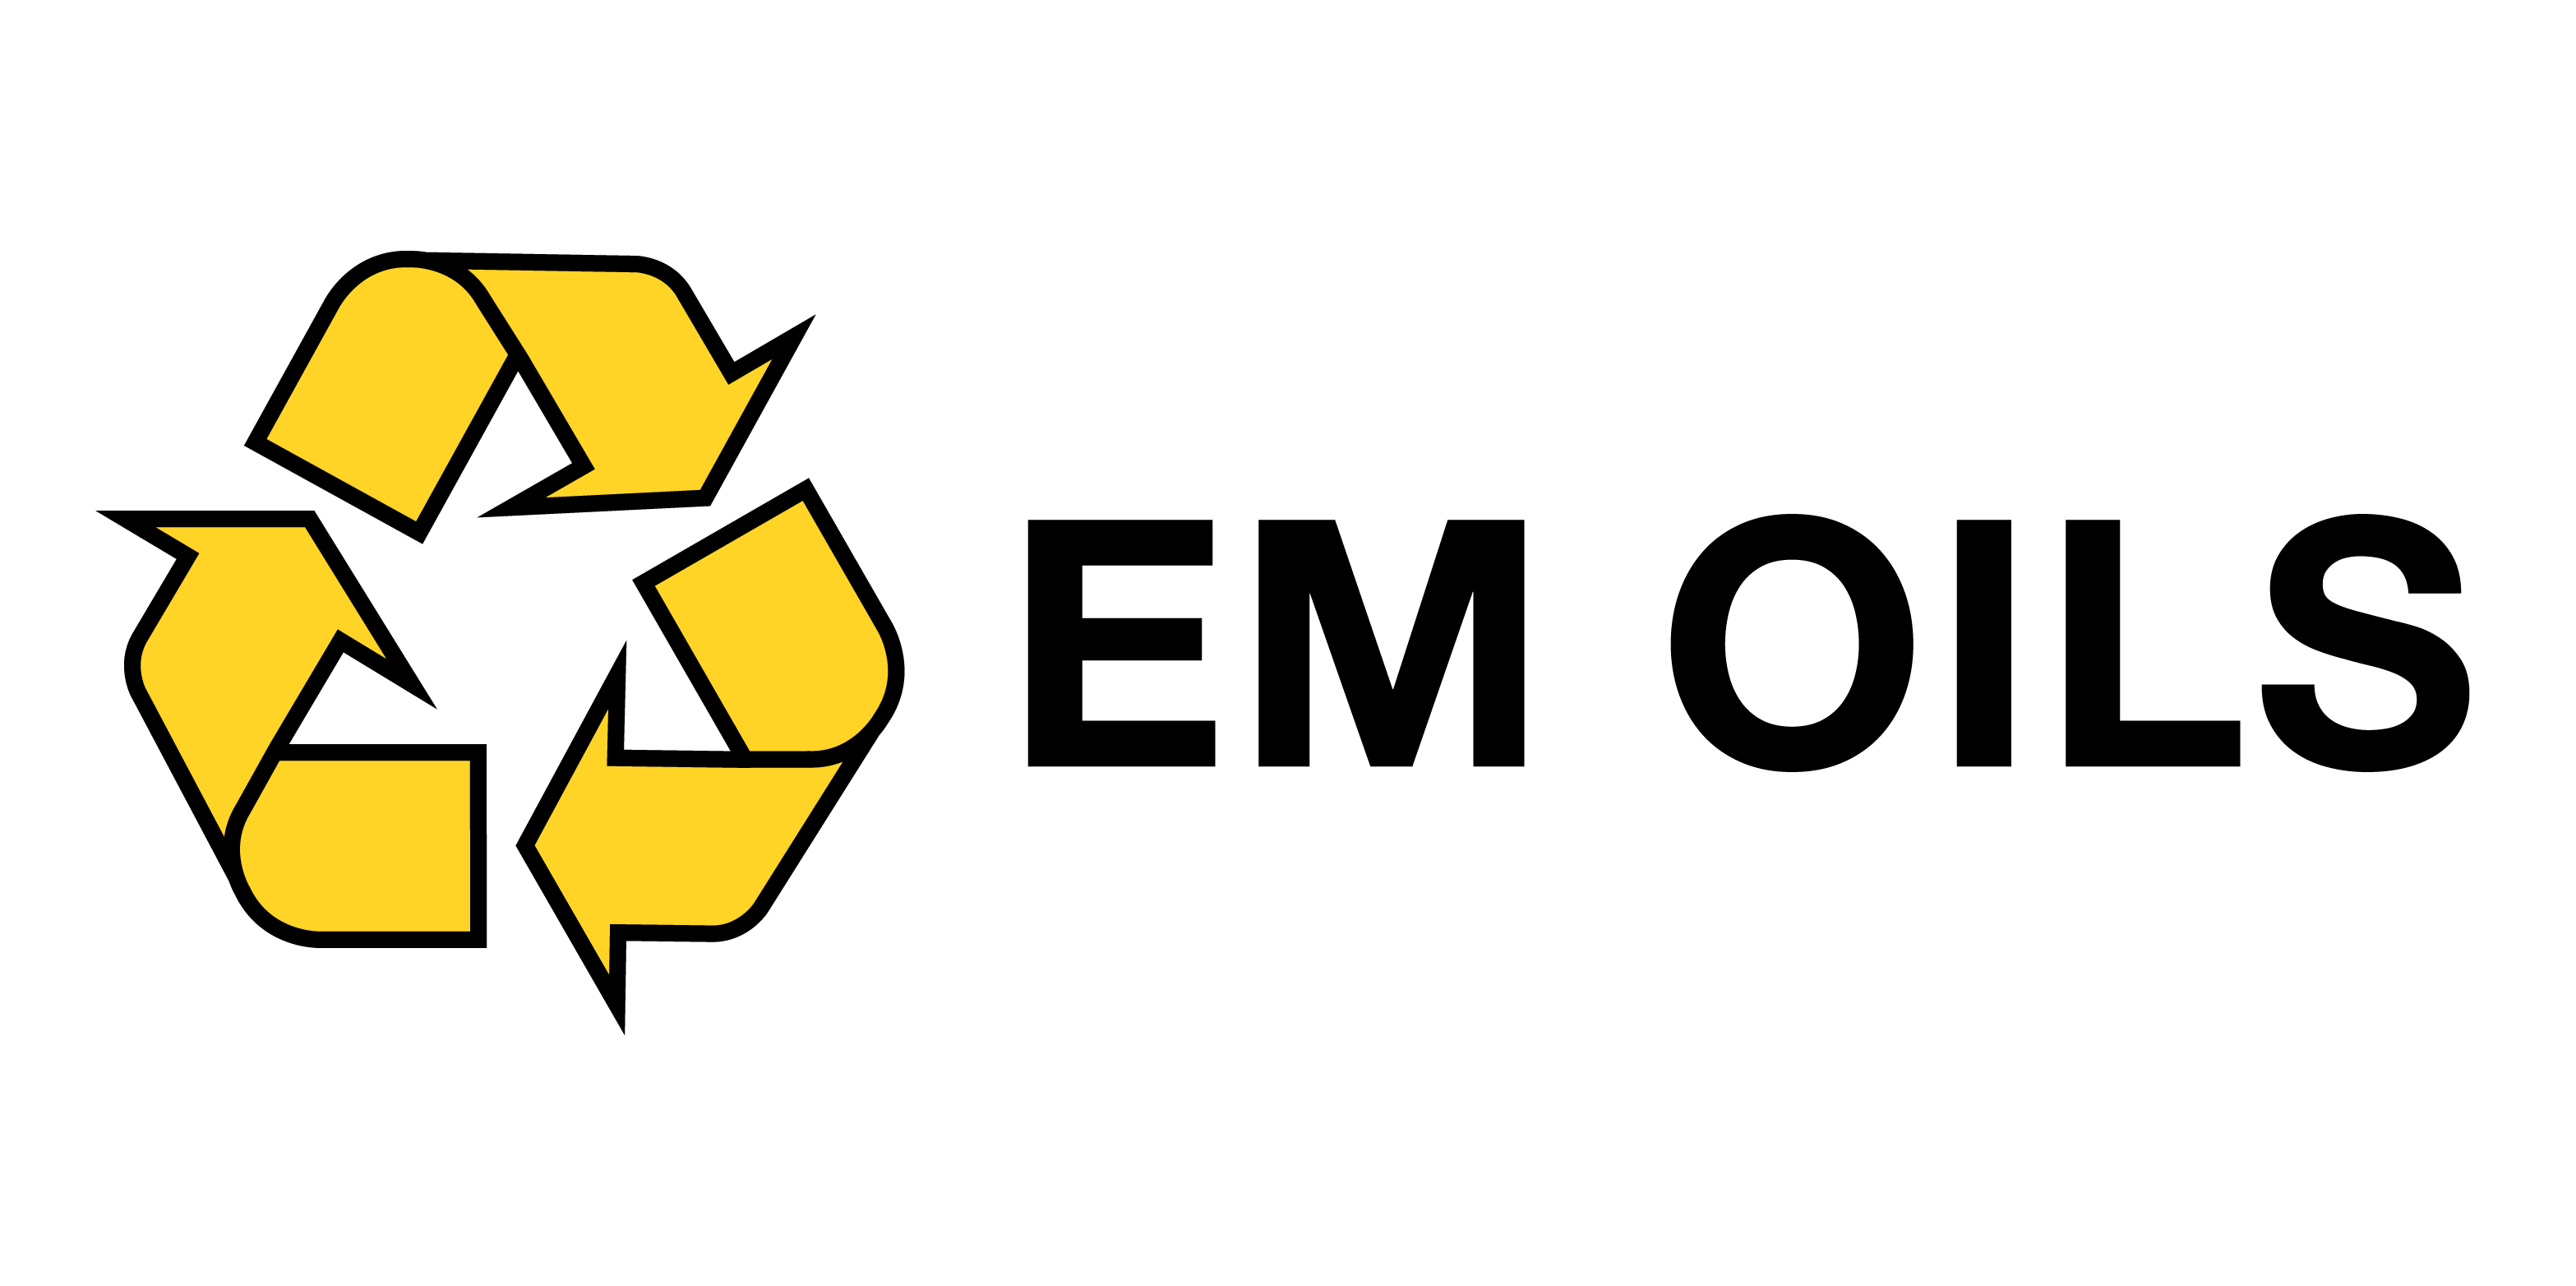 EM Oils Ltd